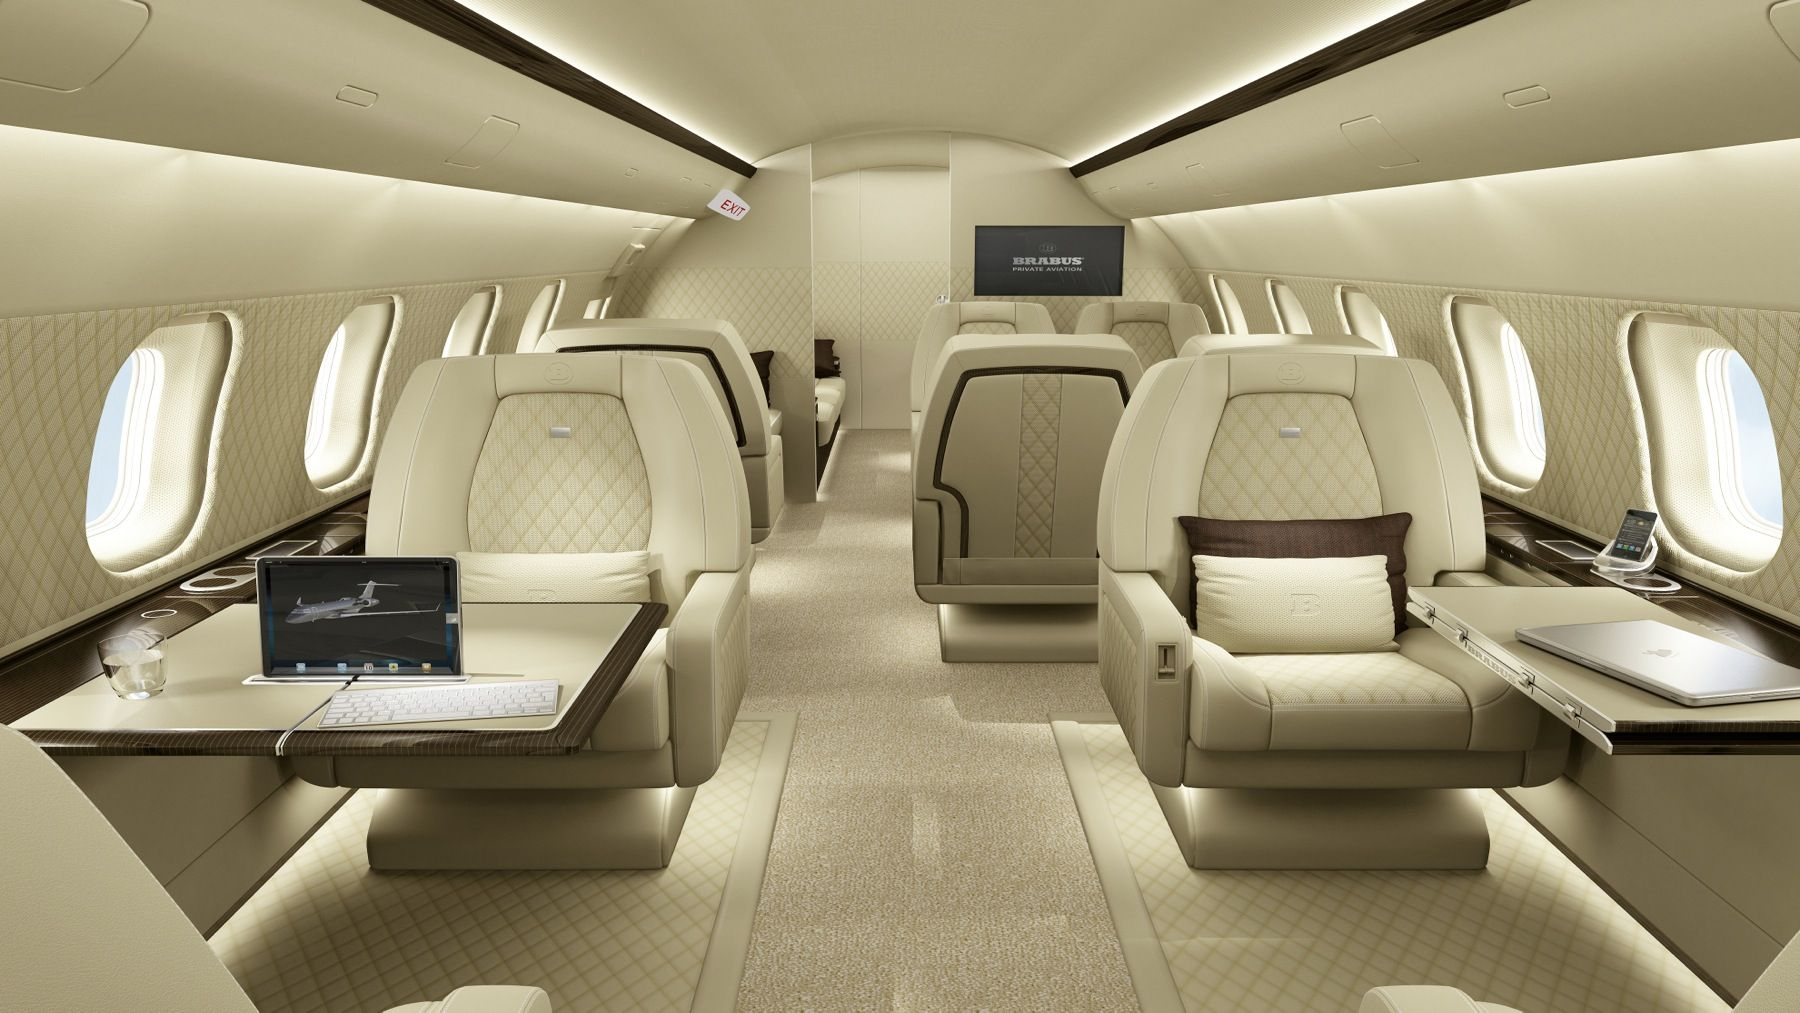 Gulfstream g650 interior bedroom 豪华私人飞机 iacharterjets  private jets  pinterest